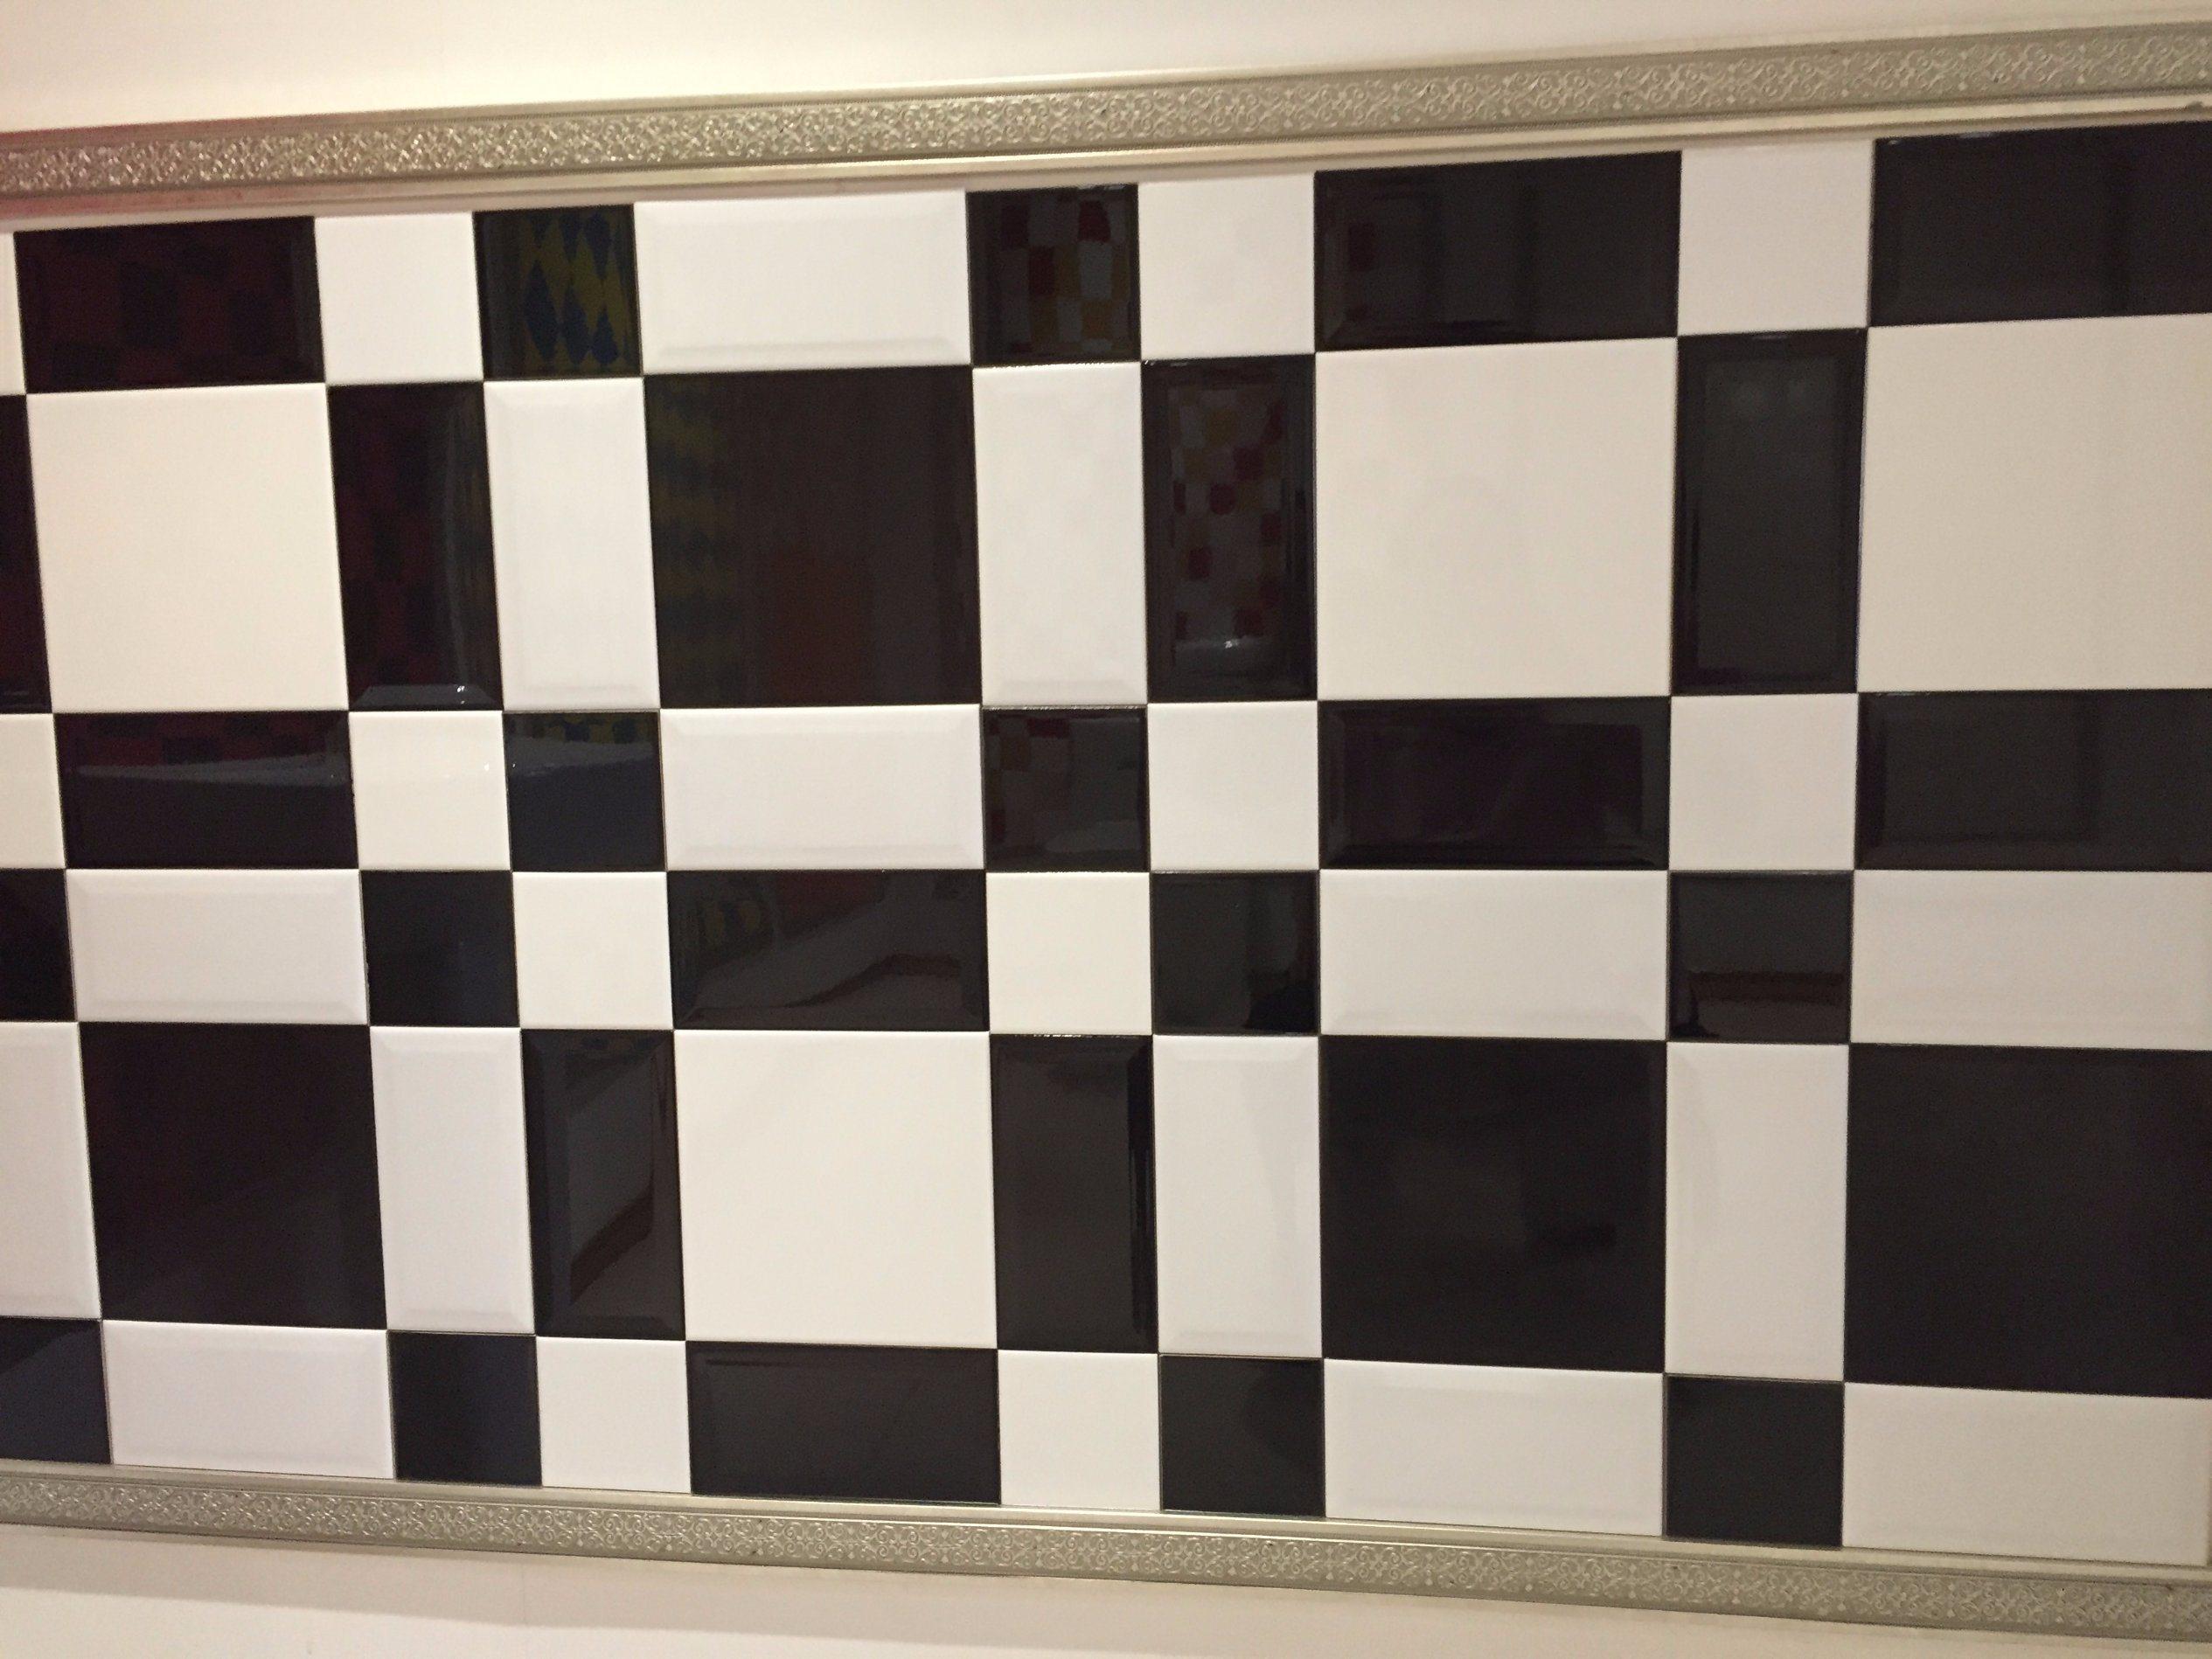 China 3x675x15cm Black Glossy Bevel Subway Tiles For Kitchen